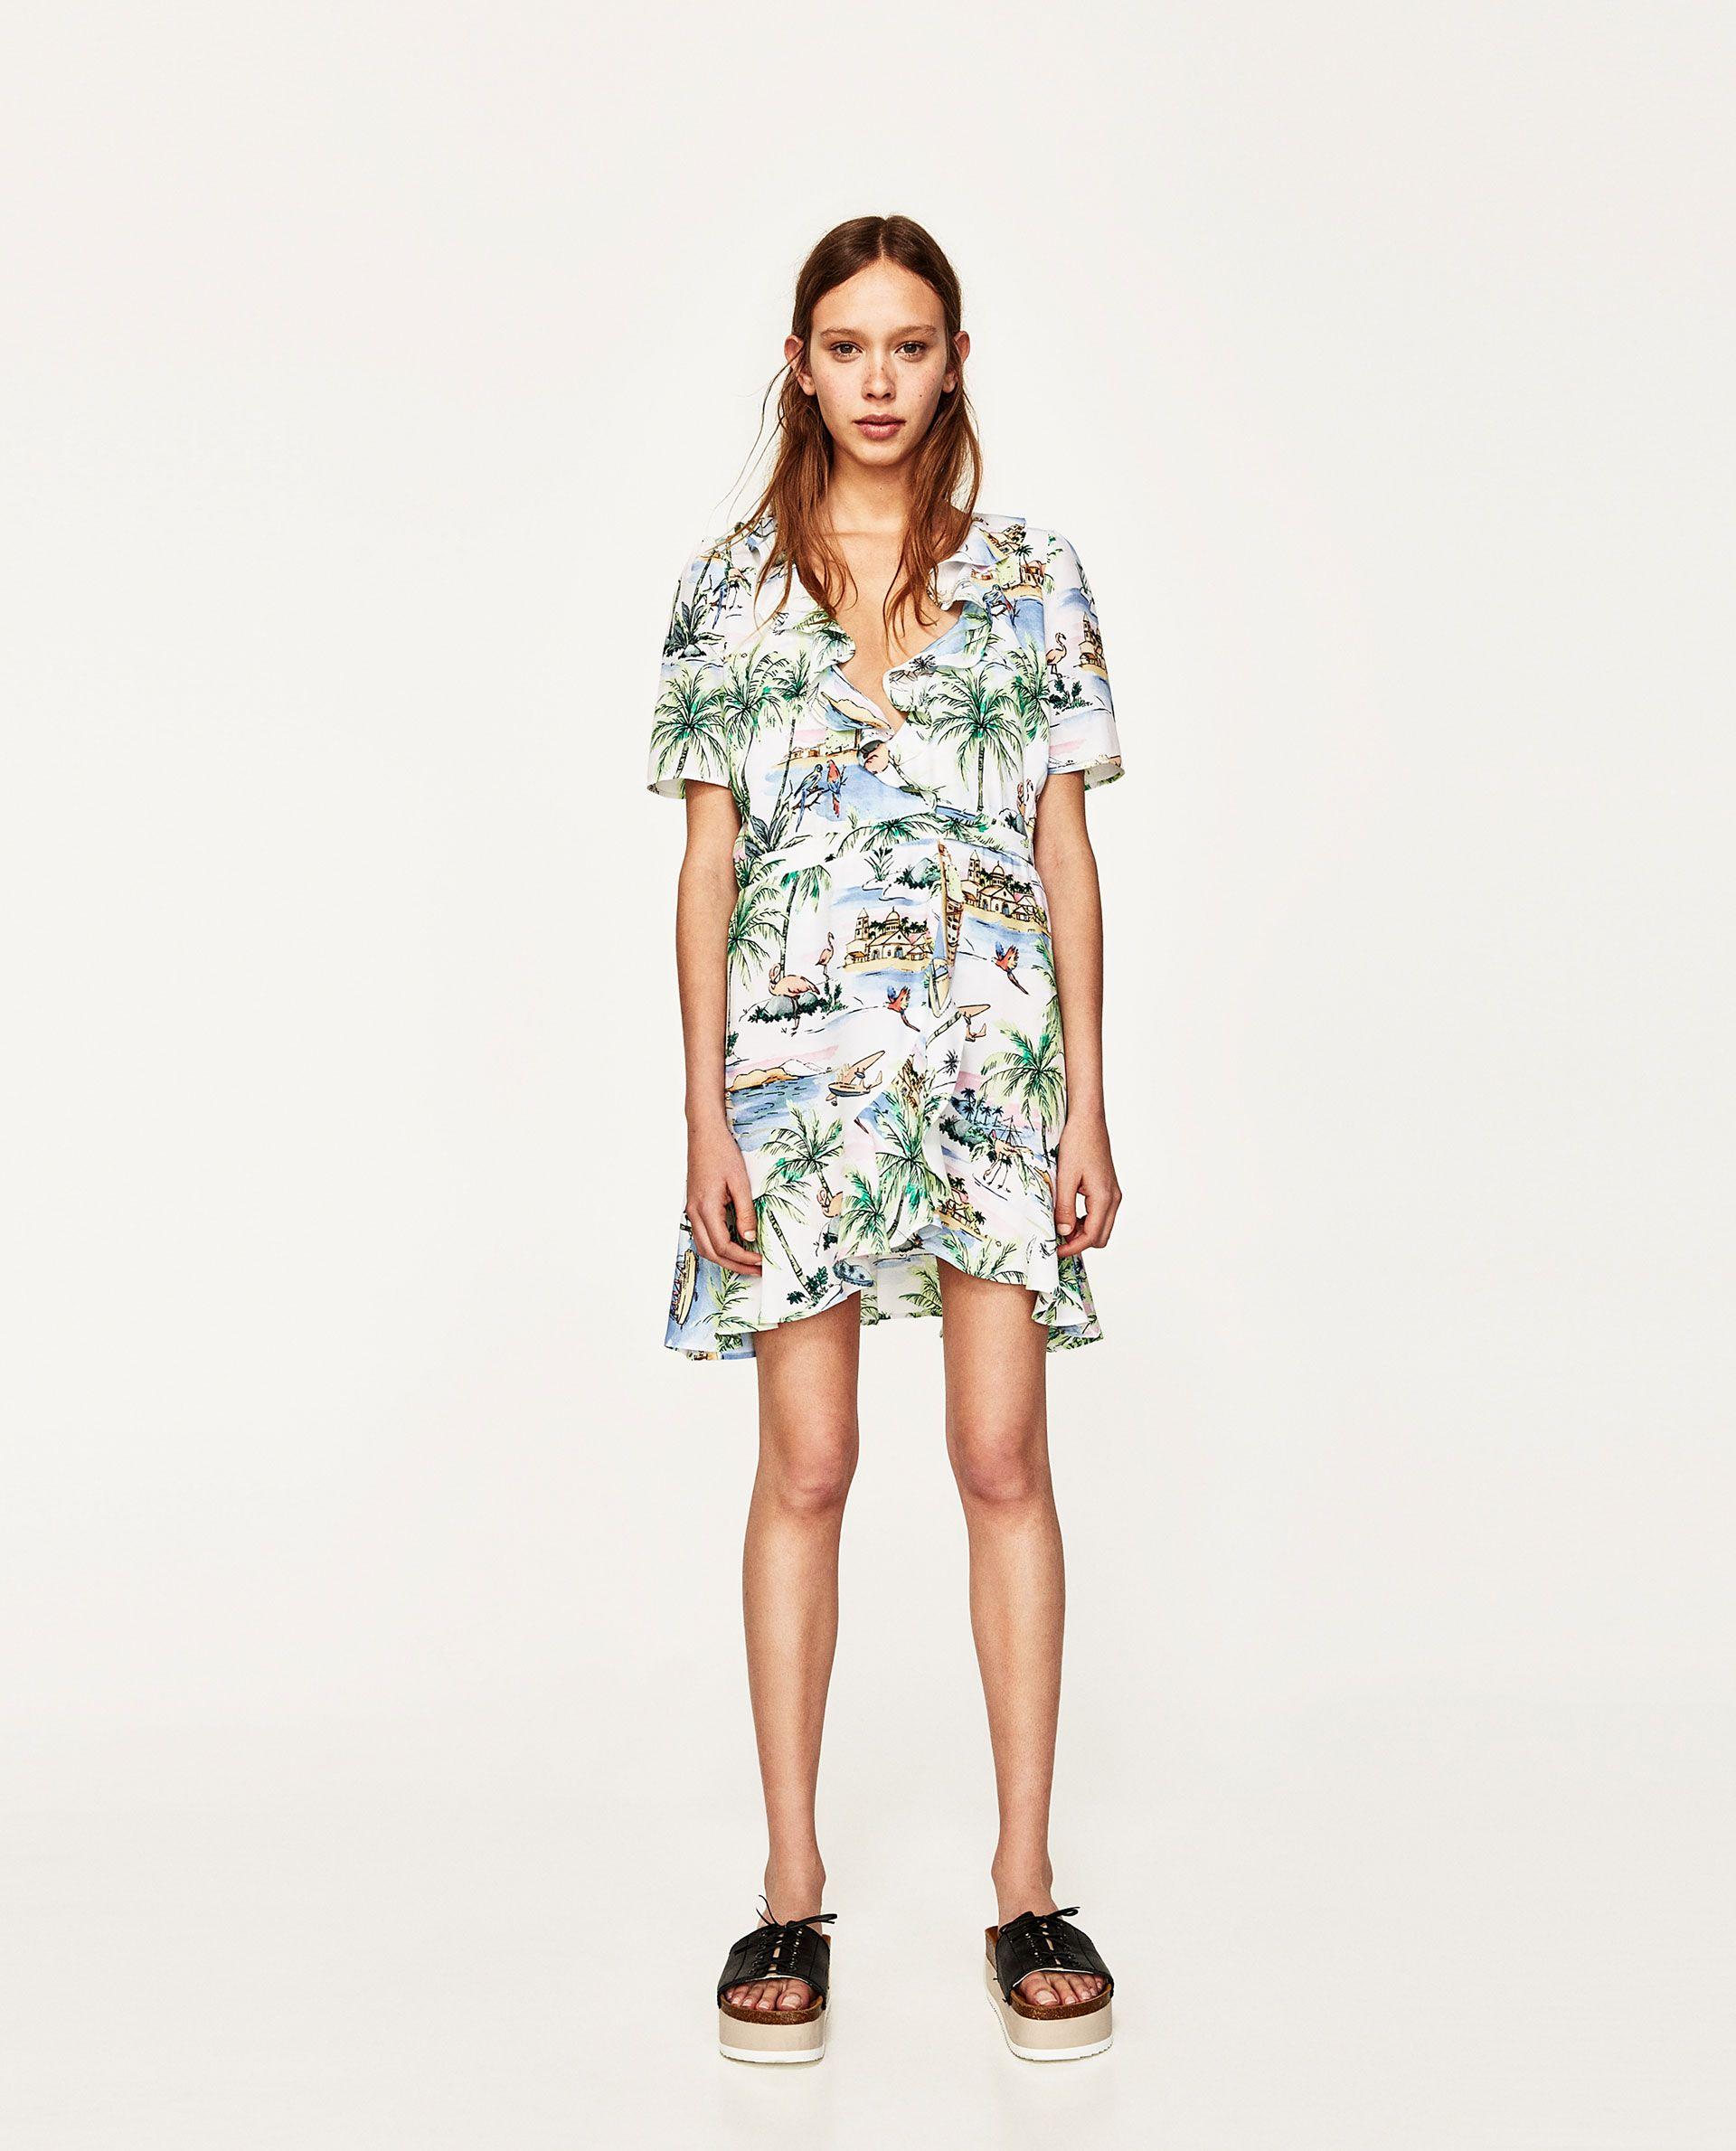 Vestido Corto Cruzado Wrap Dress Short Summer Wear For Women Zara Fashion